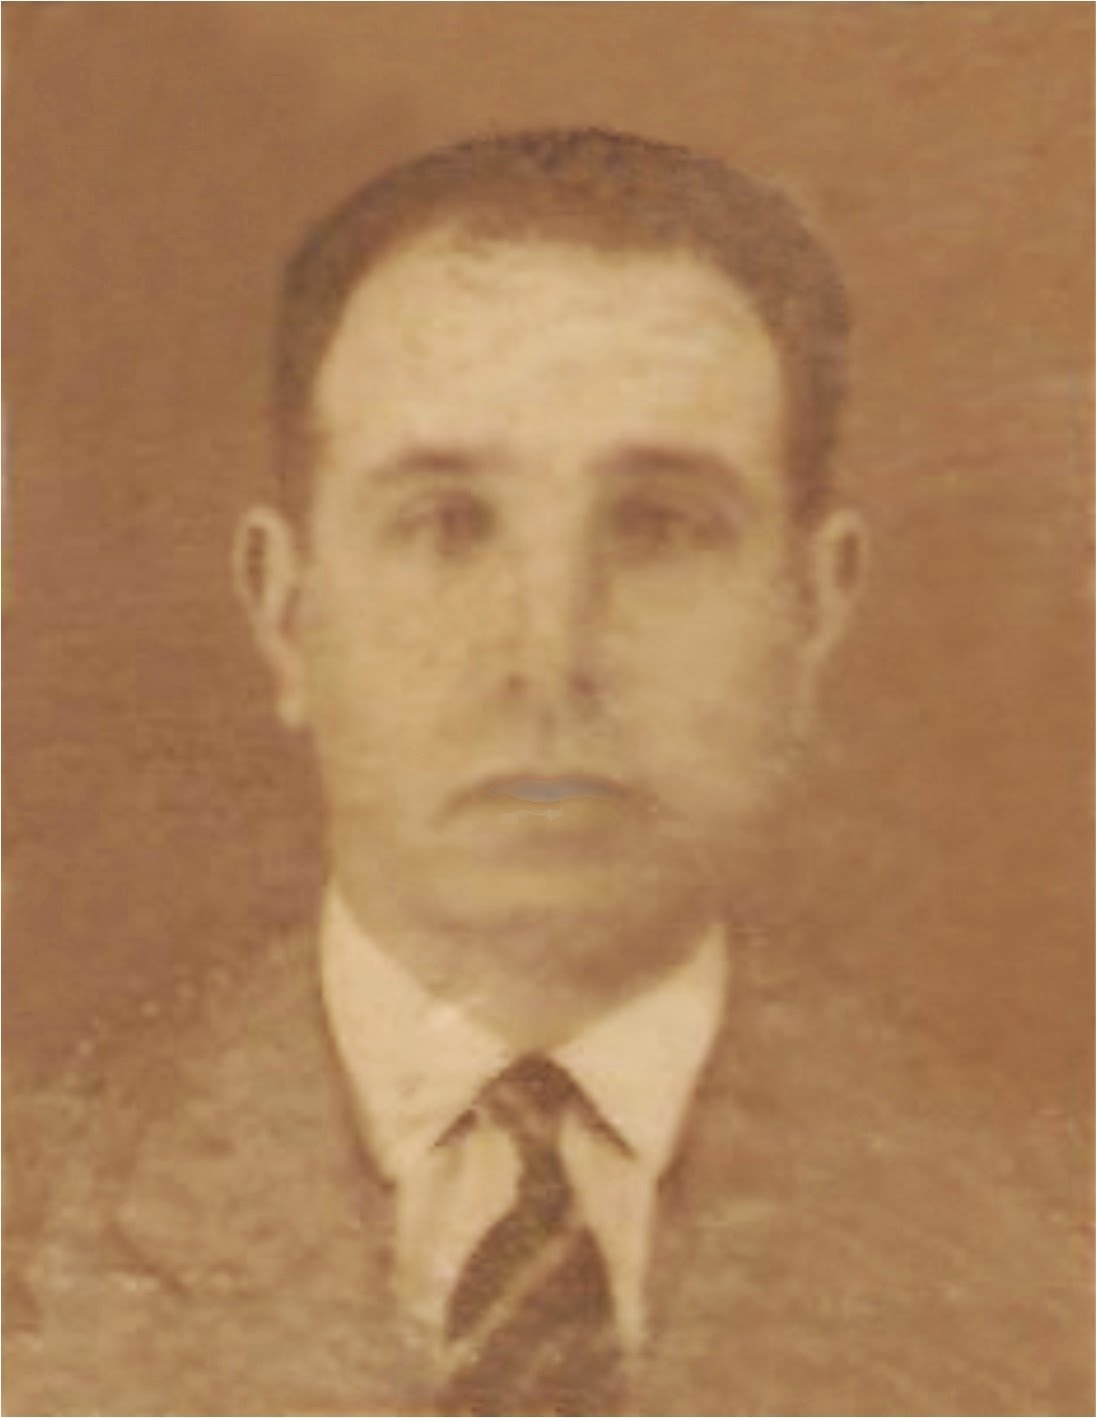 Antonio Martins Fontoura Borges